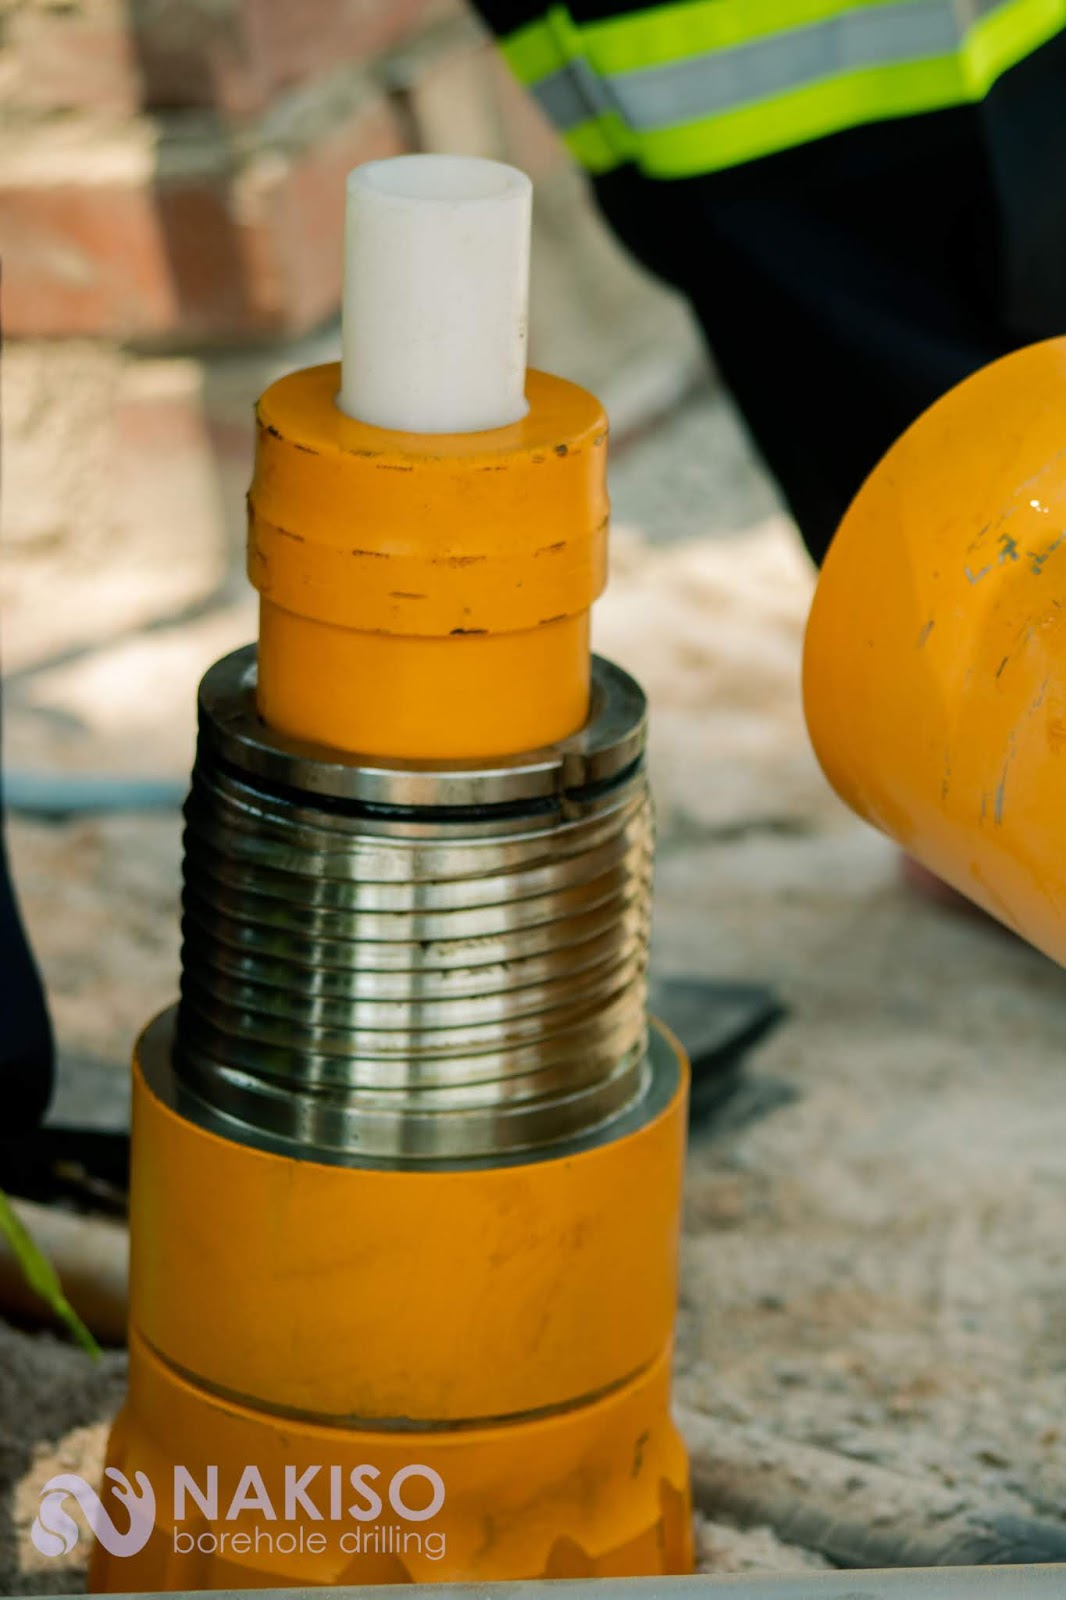 Nakiso Borehole Drilling Hard Rock Borehole Drilling Drill Bits!